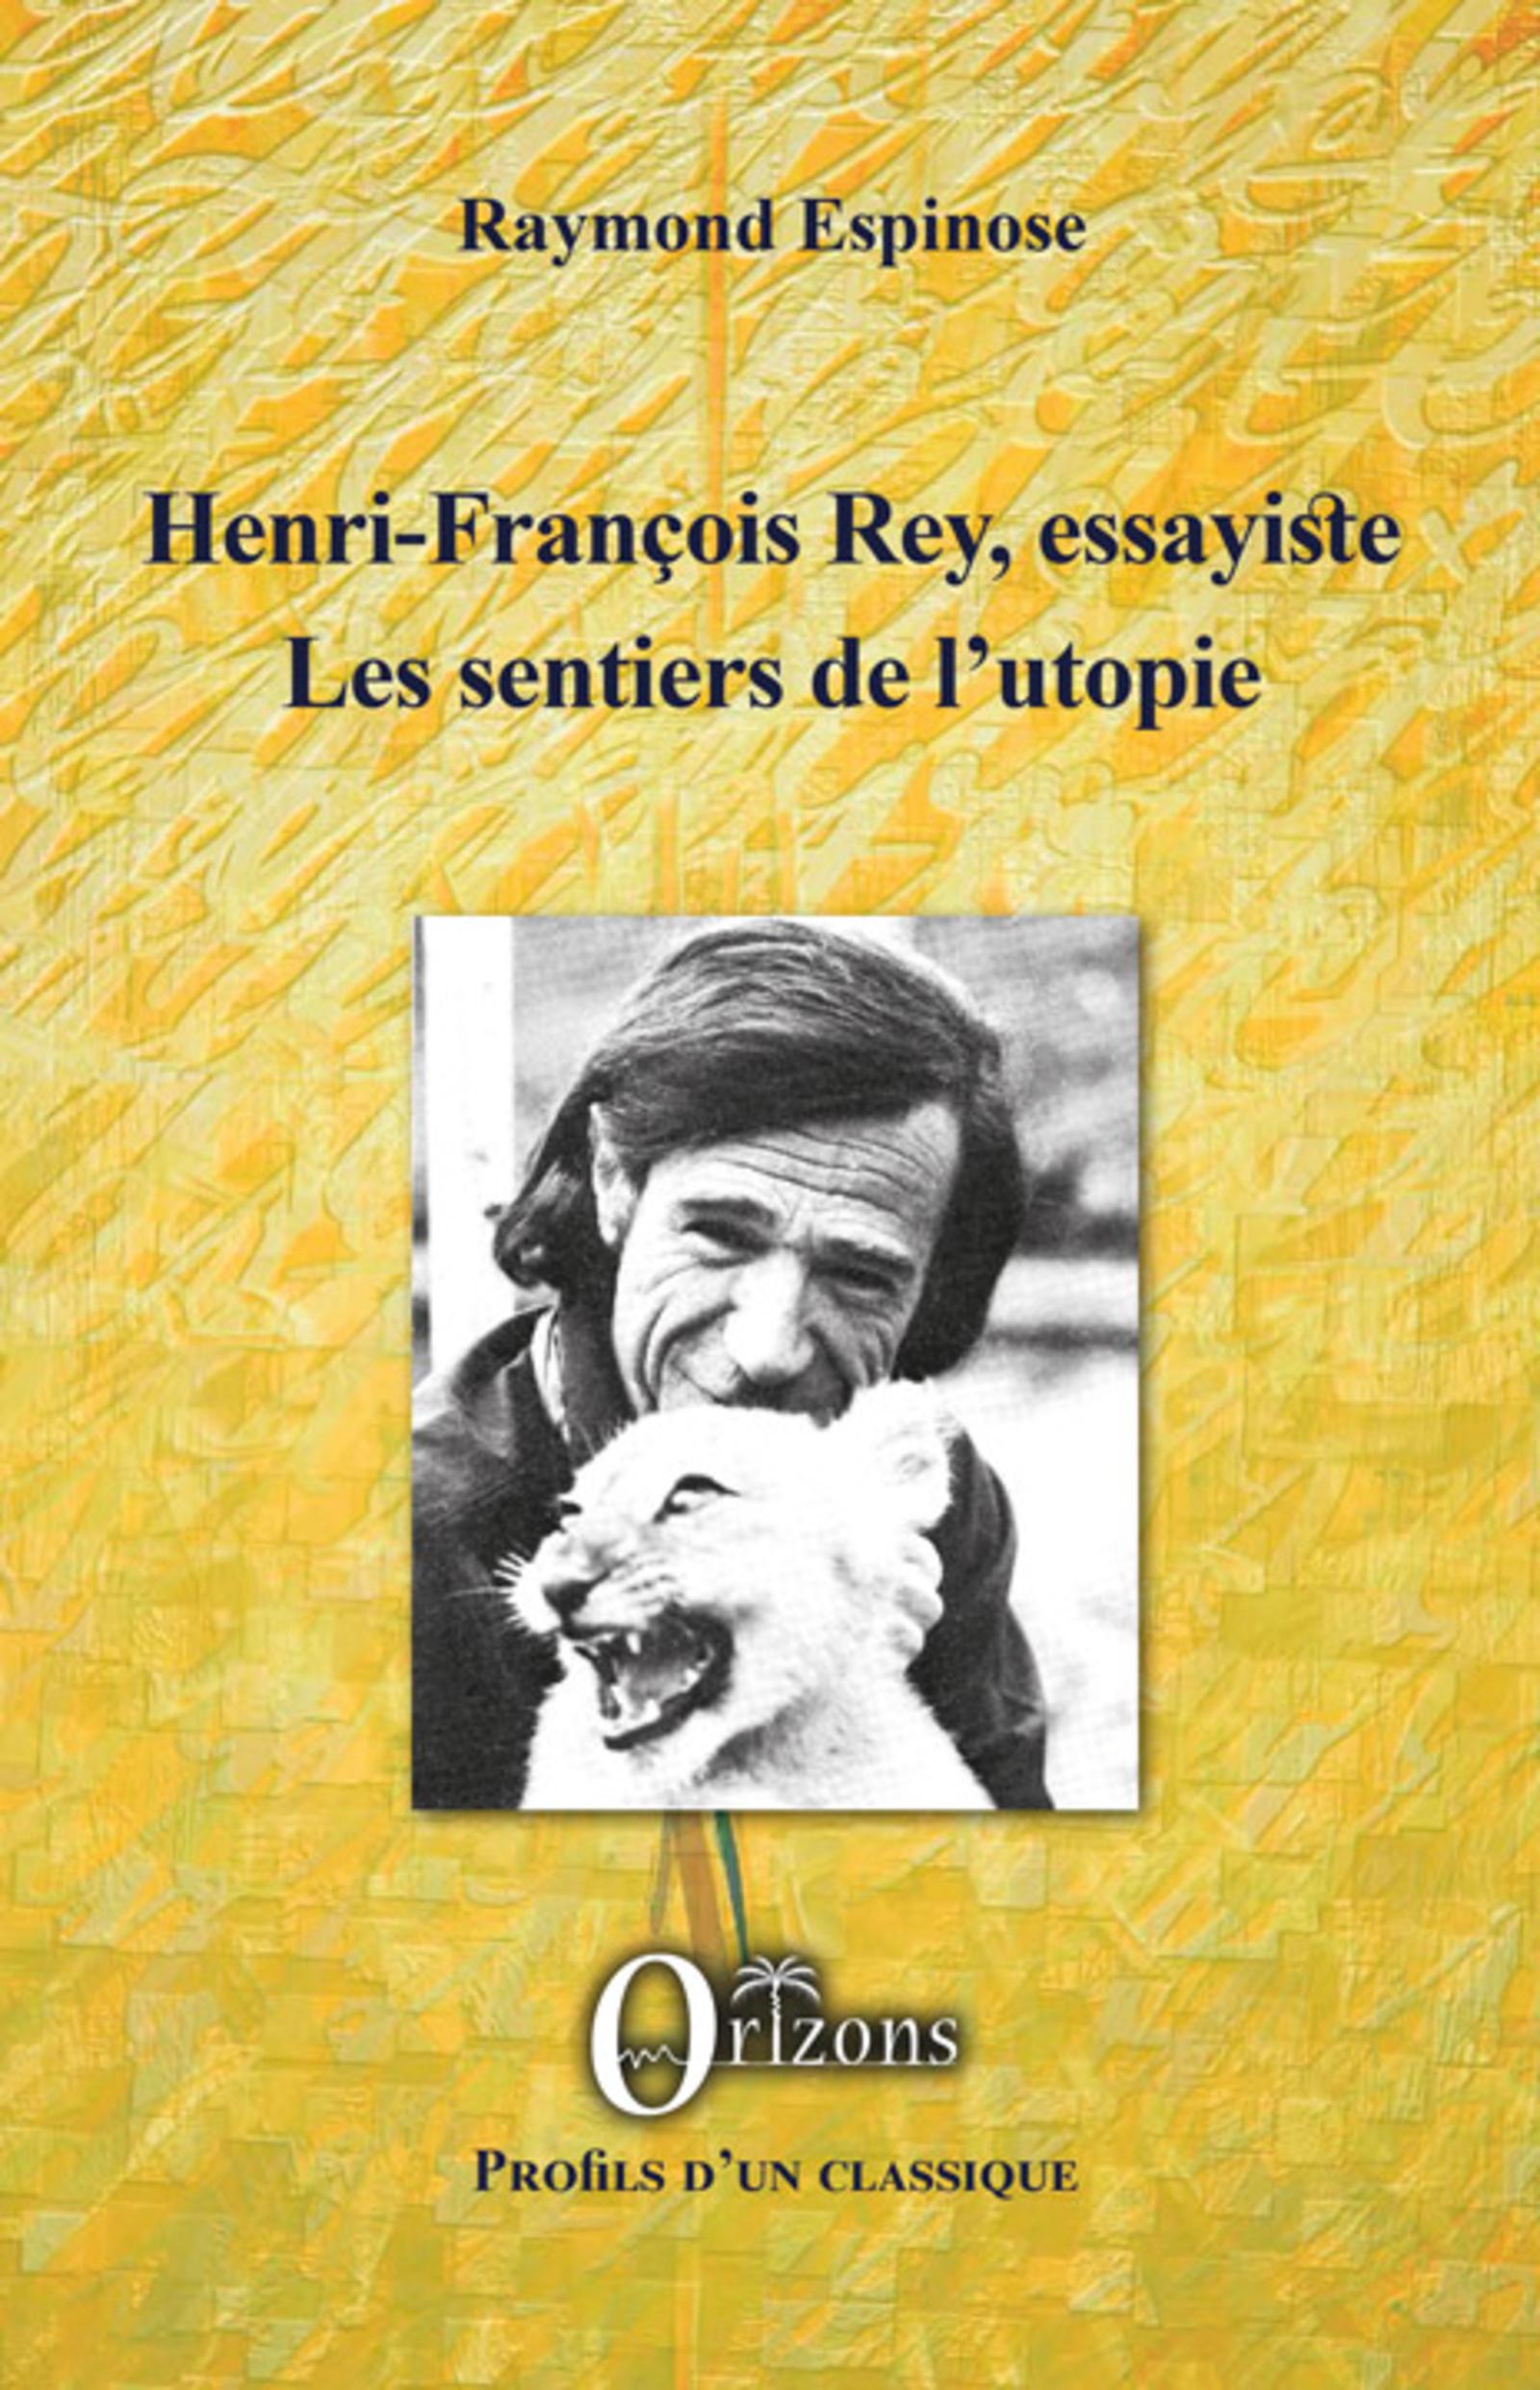 Henri-Fran?ois Rey,